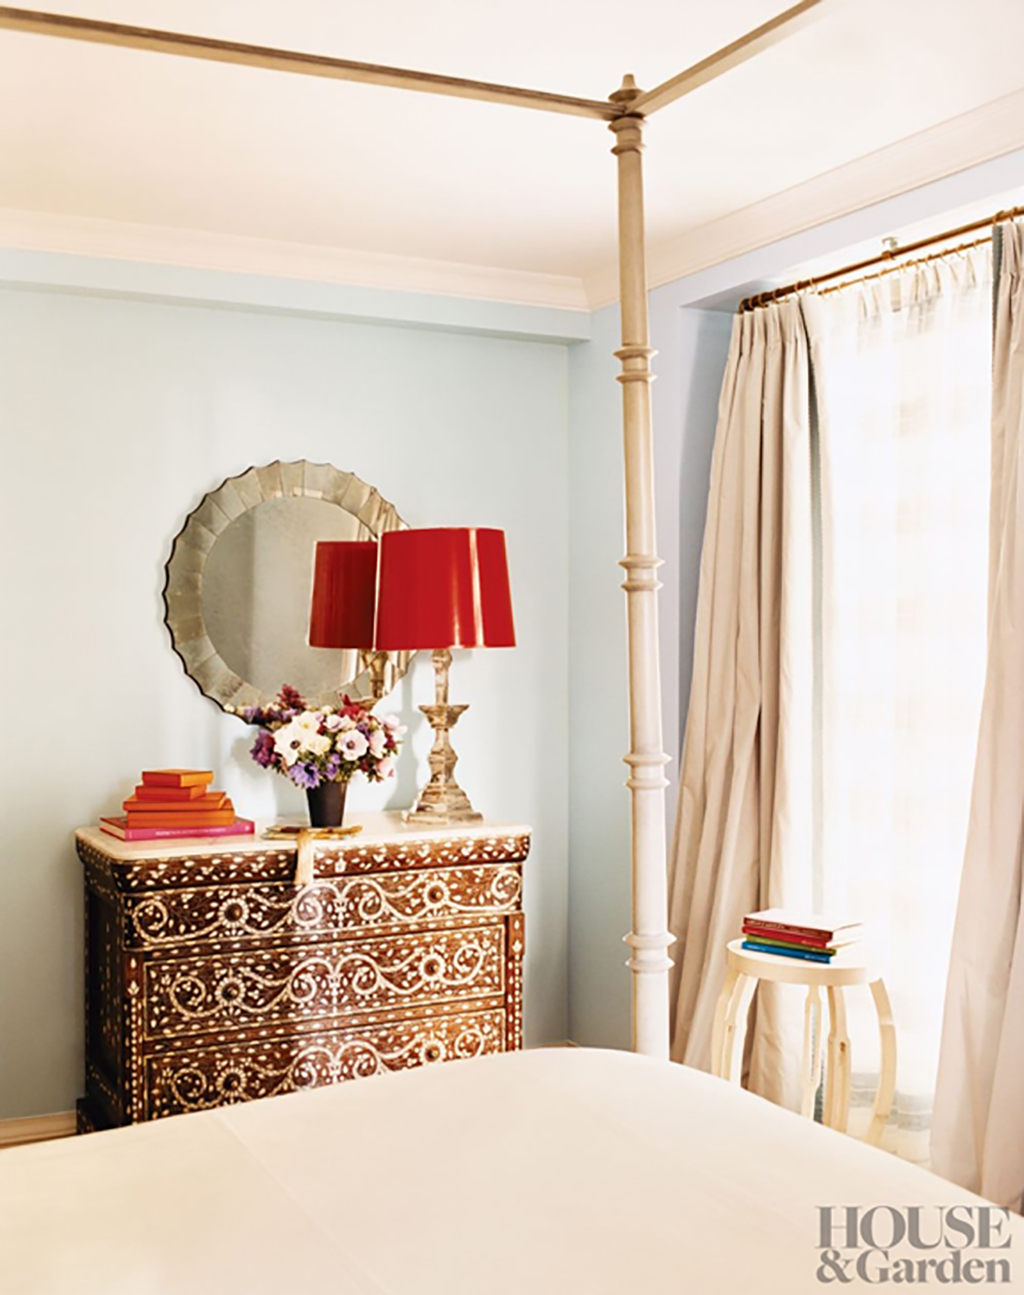 Ivanka Trumps bedroom by Emma Jane Pilington